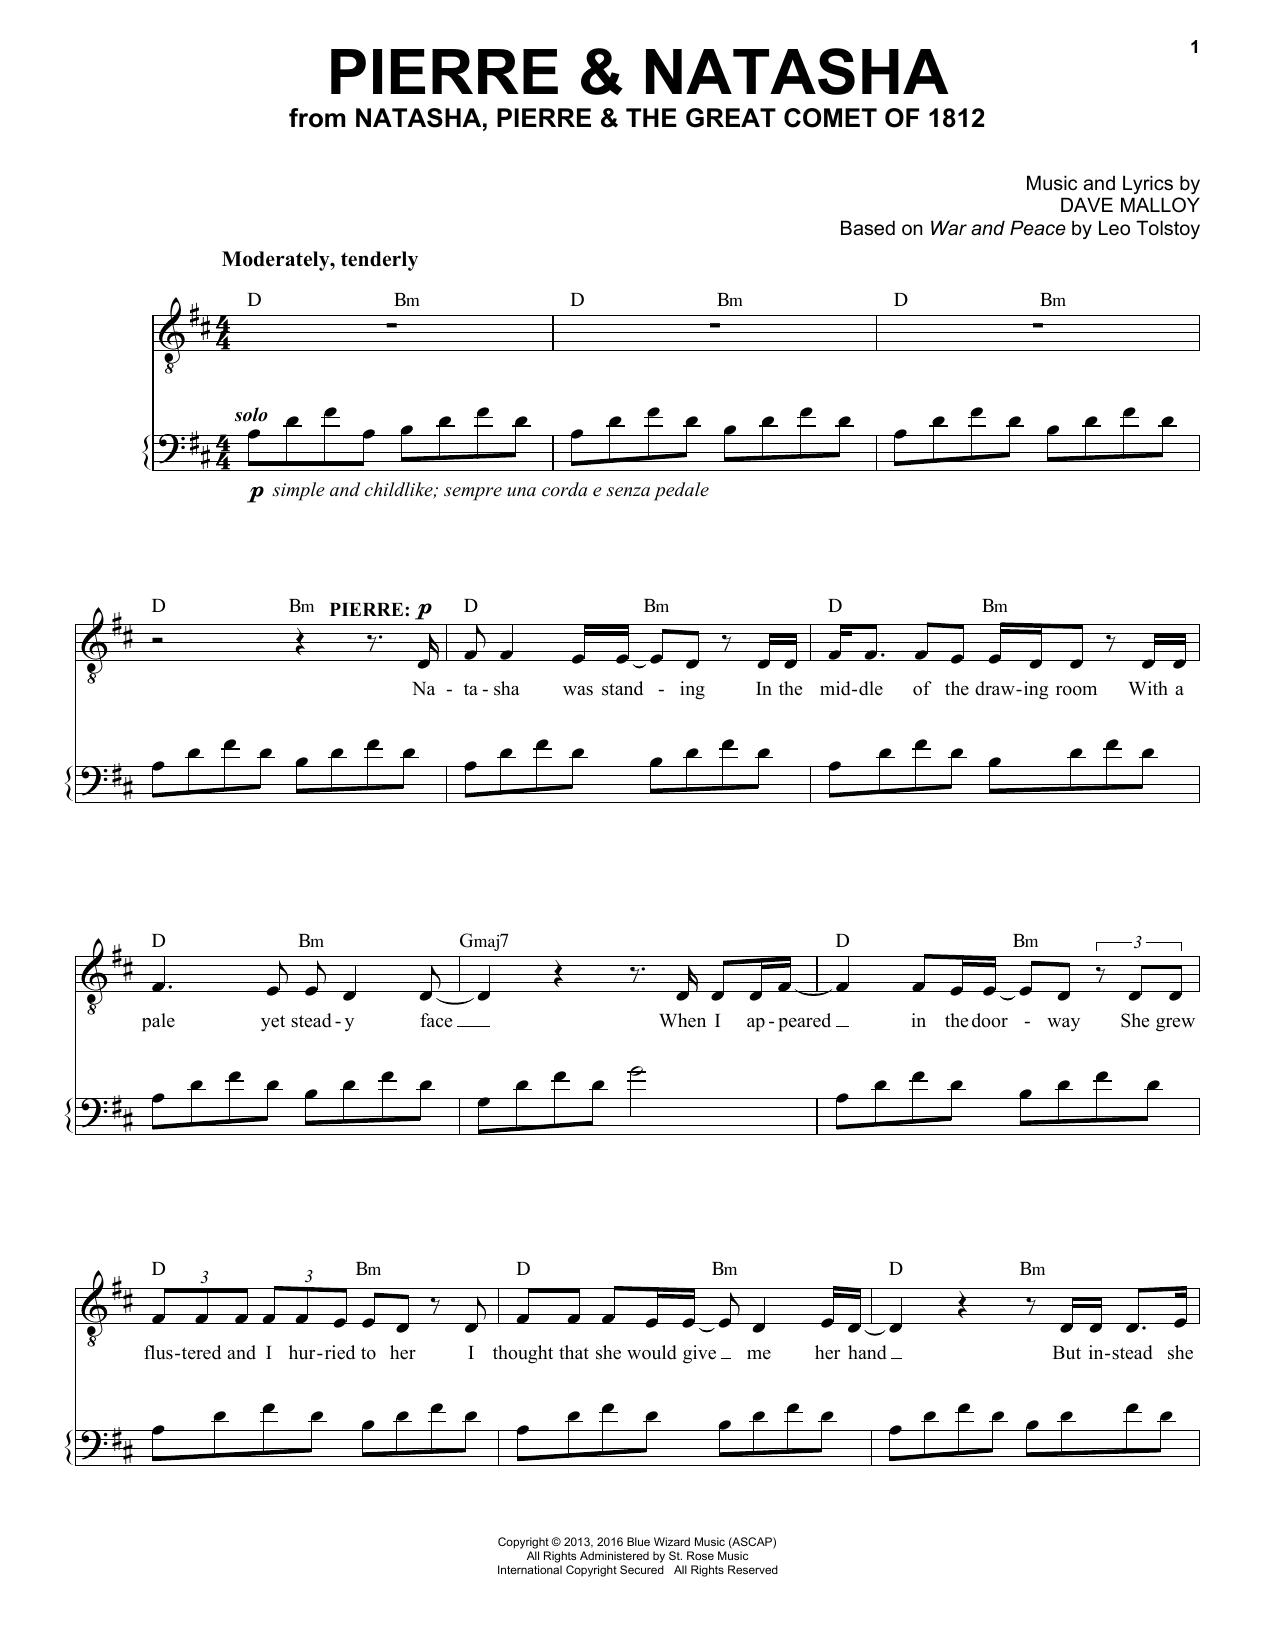 Pierre & Natasha (from Natasha, Pierre & The Great Comet of 1812) (Piano & Vocal)